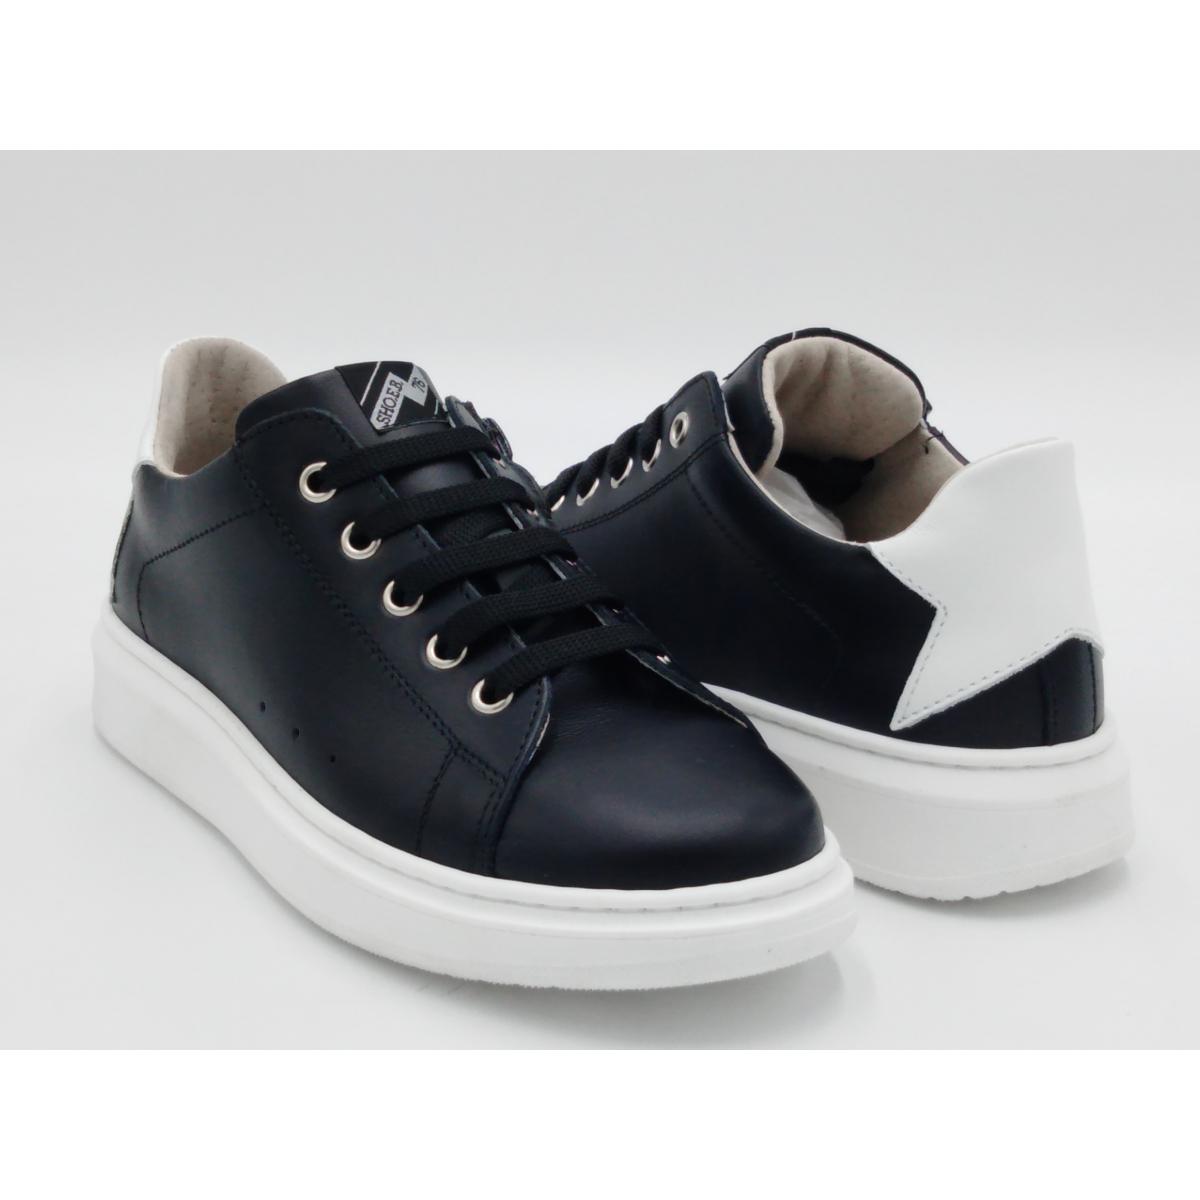 SHOEB 76 -Sneaker nera lacci